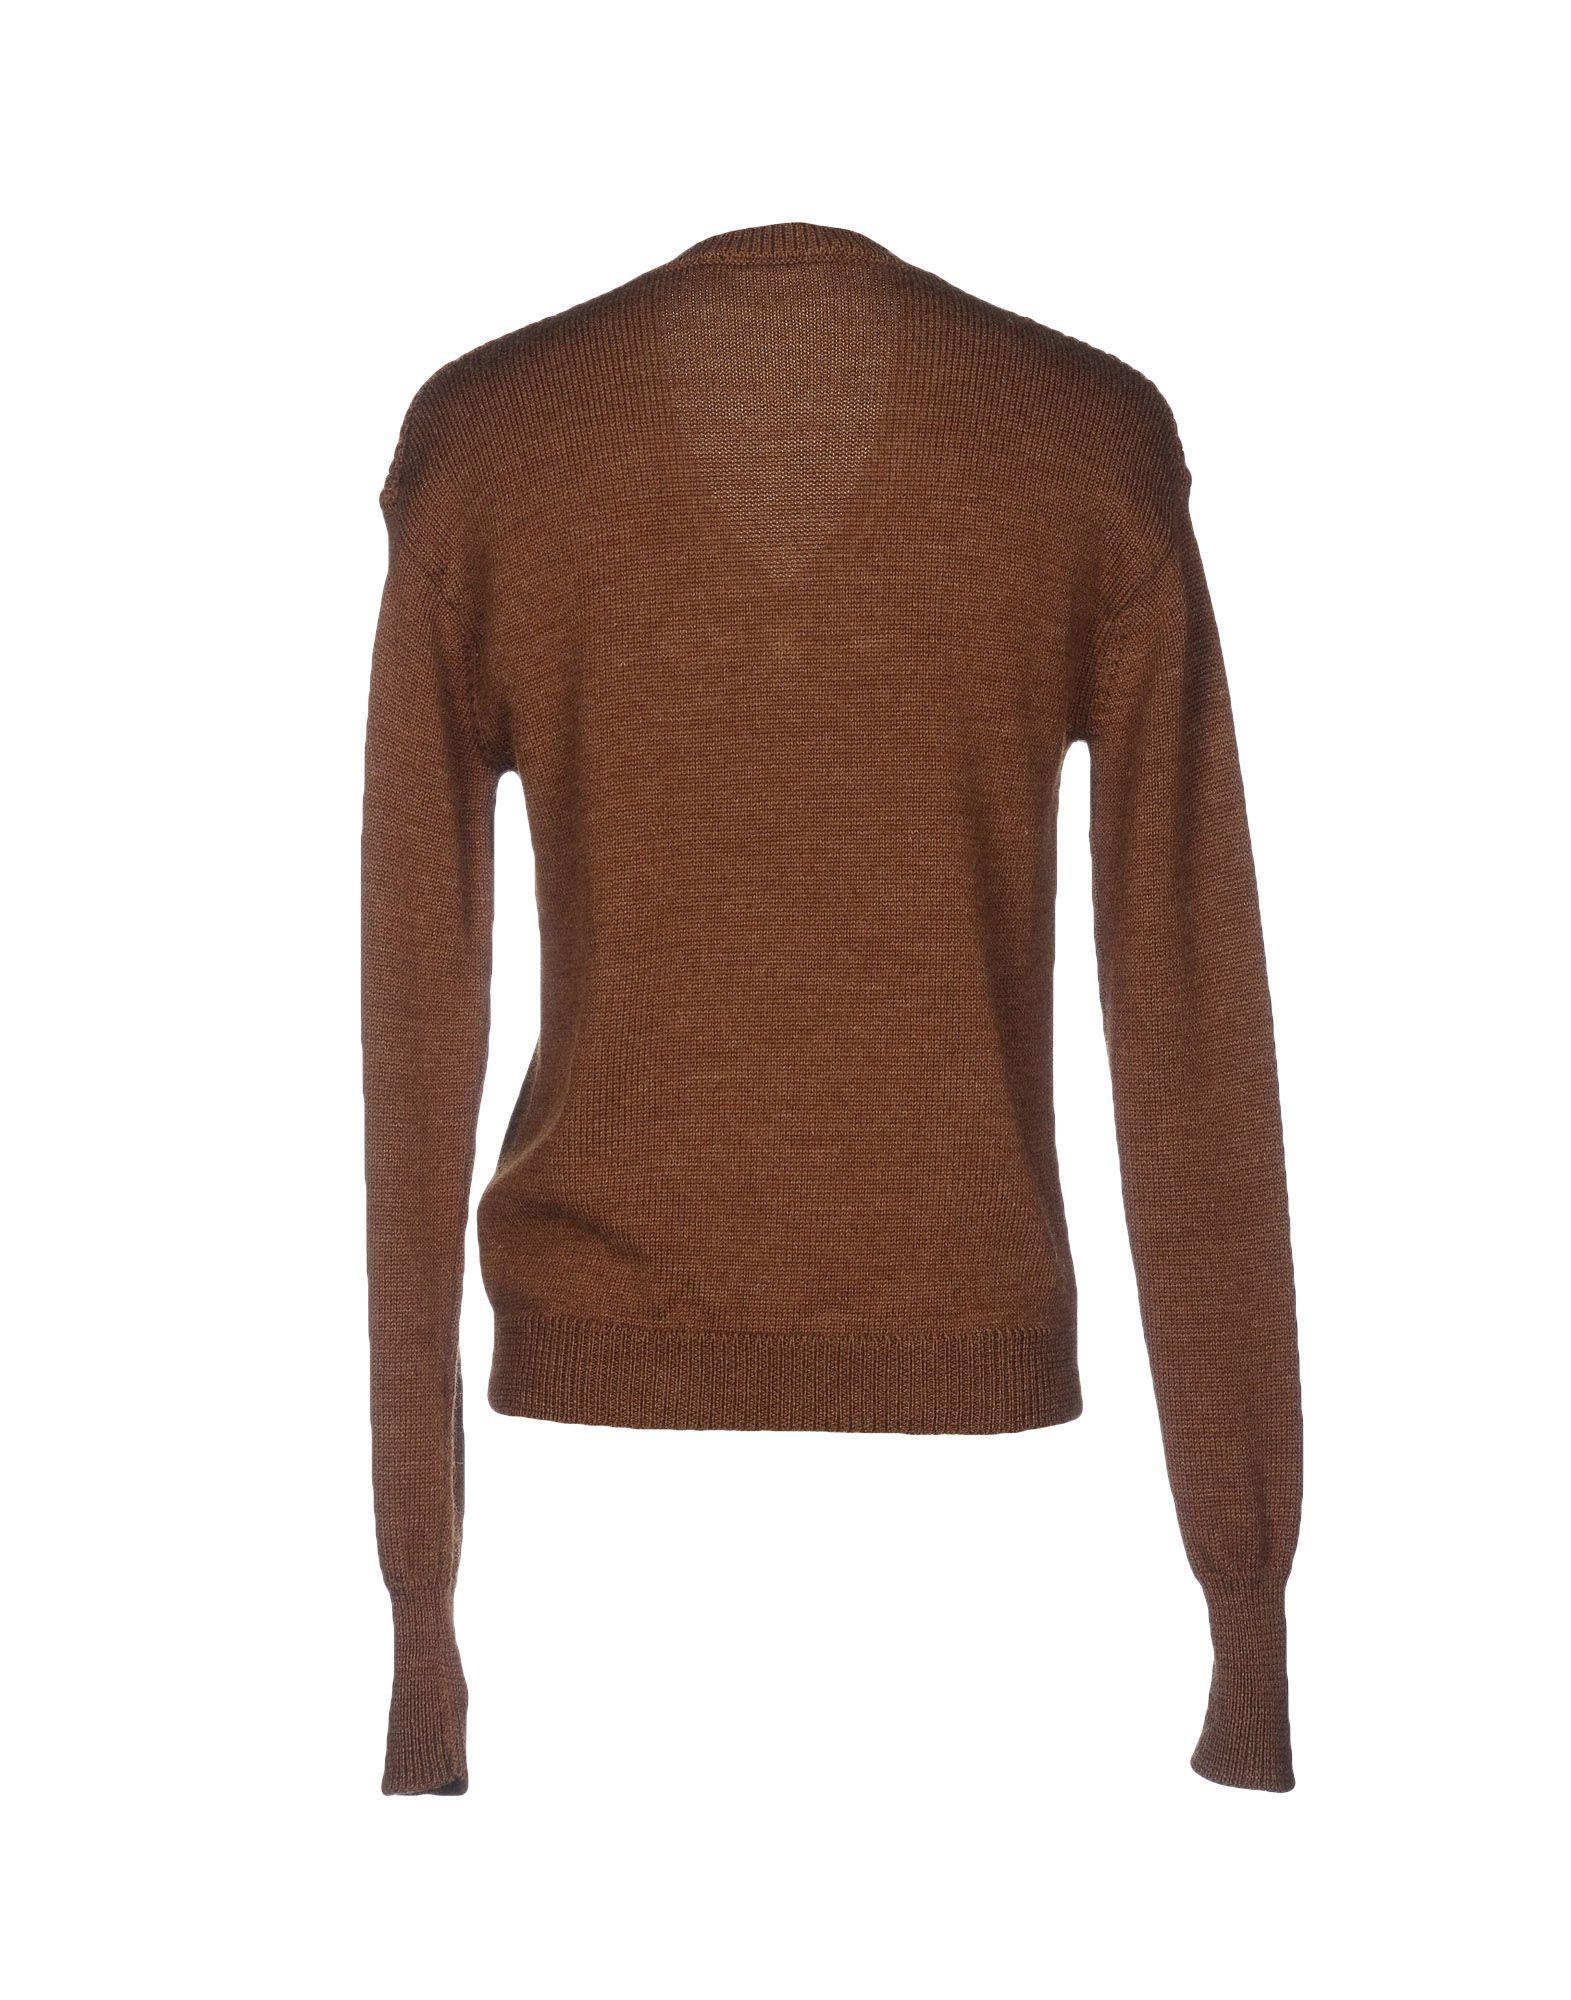 Dsquared2 Khaki Wool Knit V-Neck Jumper